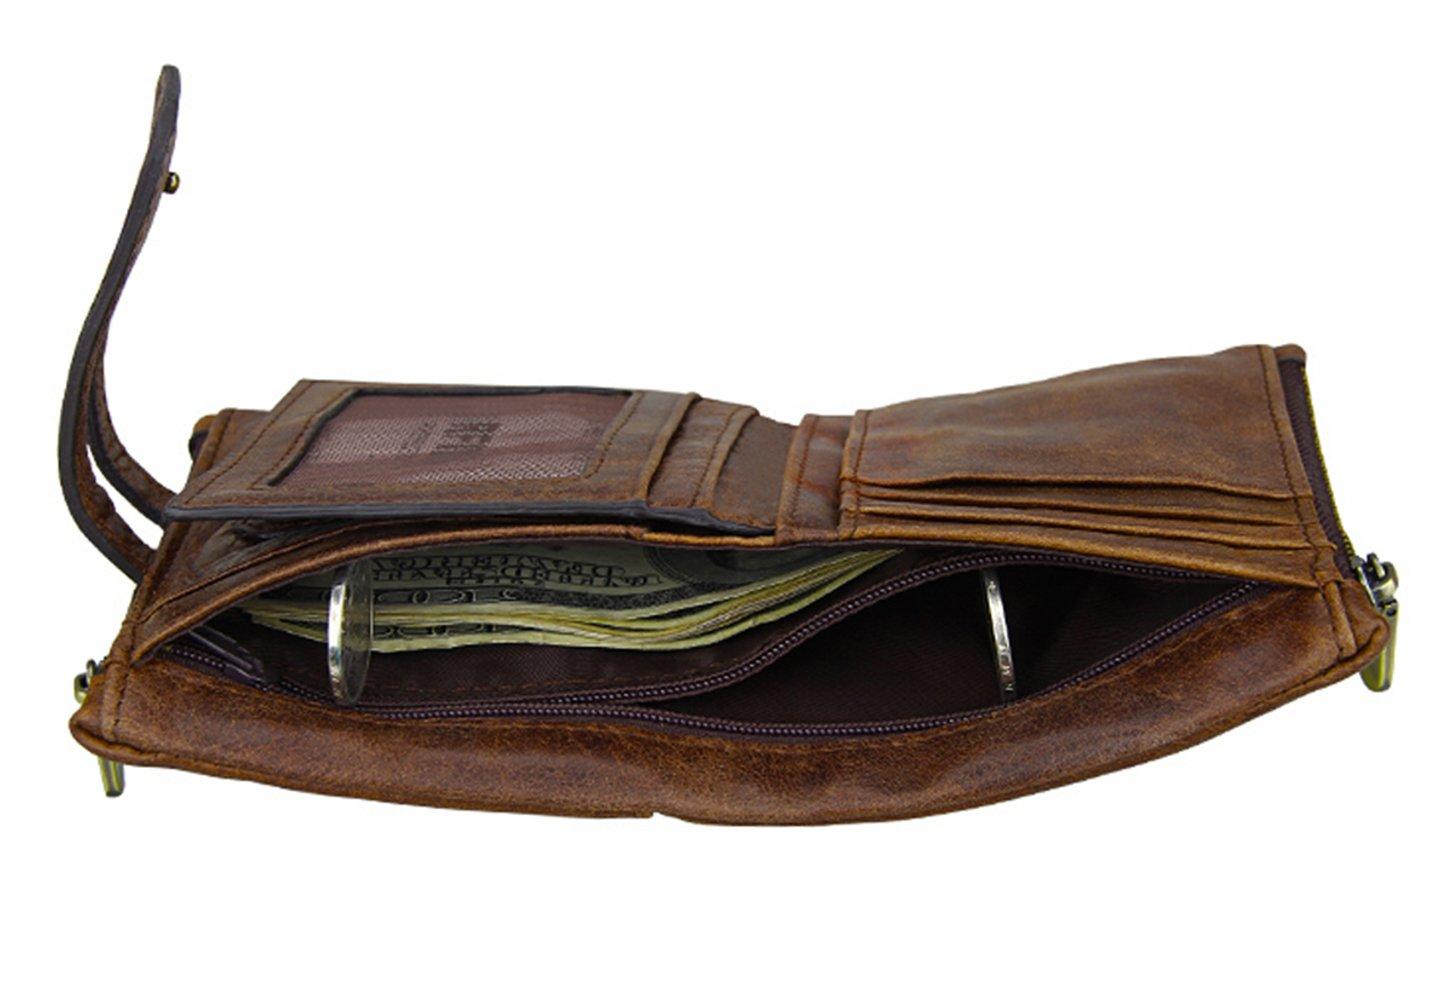 iSuperb Men's RFID Blocking Wallet Bifold Short Purse Multi Card Organizer with Double Zipper (Coffee) by iSuperb (Image #3)